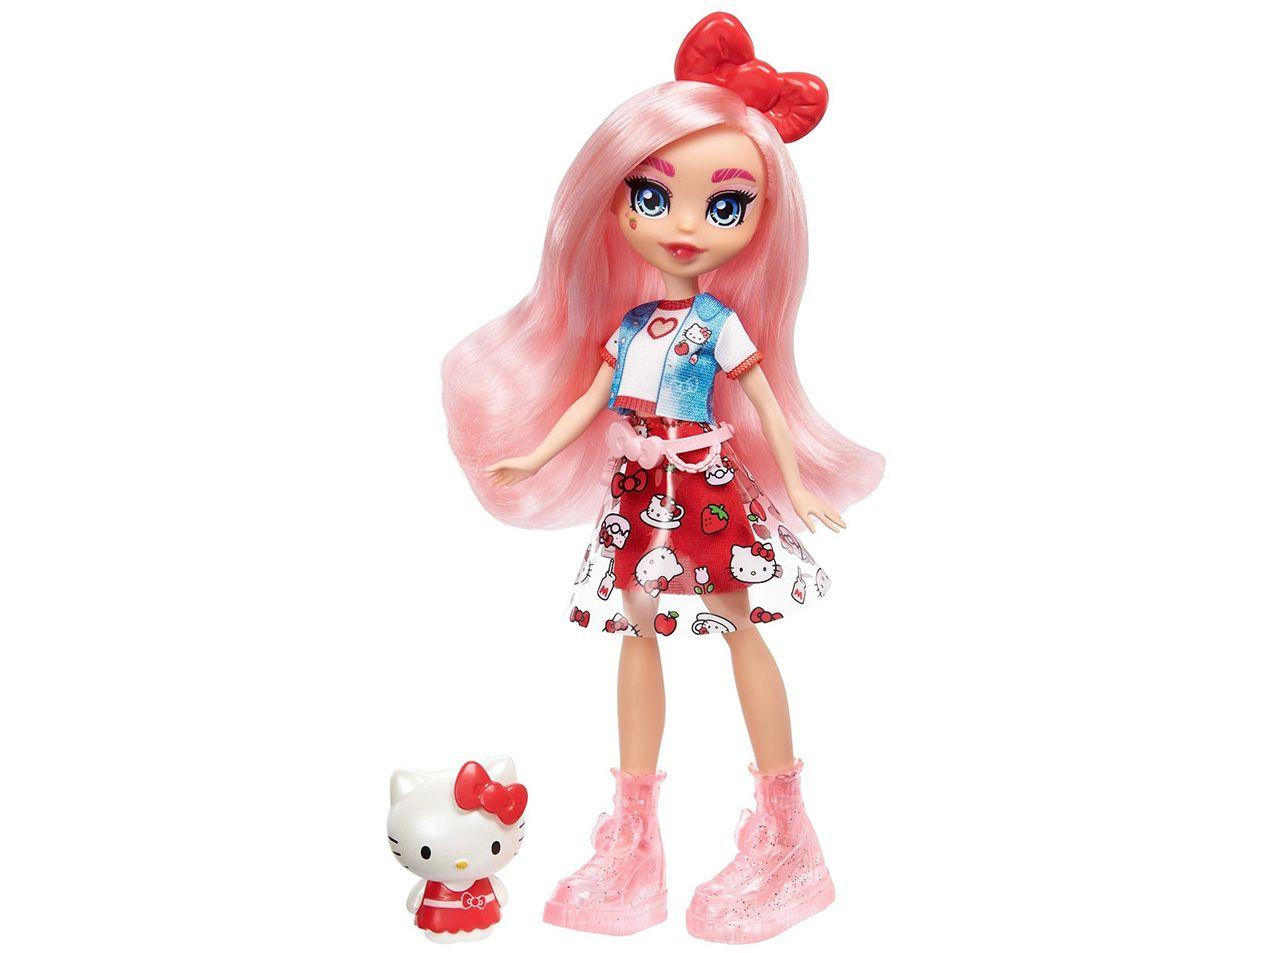 Boneca Hello Kitty Sanrio com Acessórios Mattel